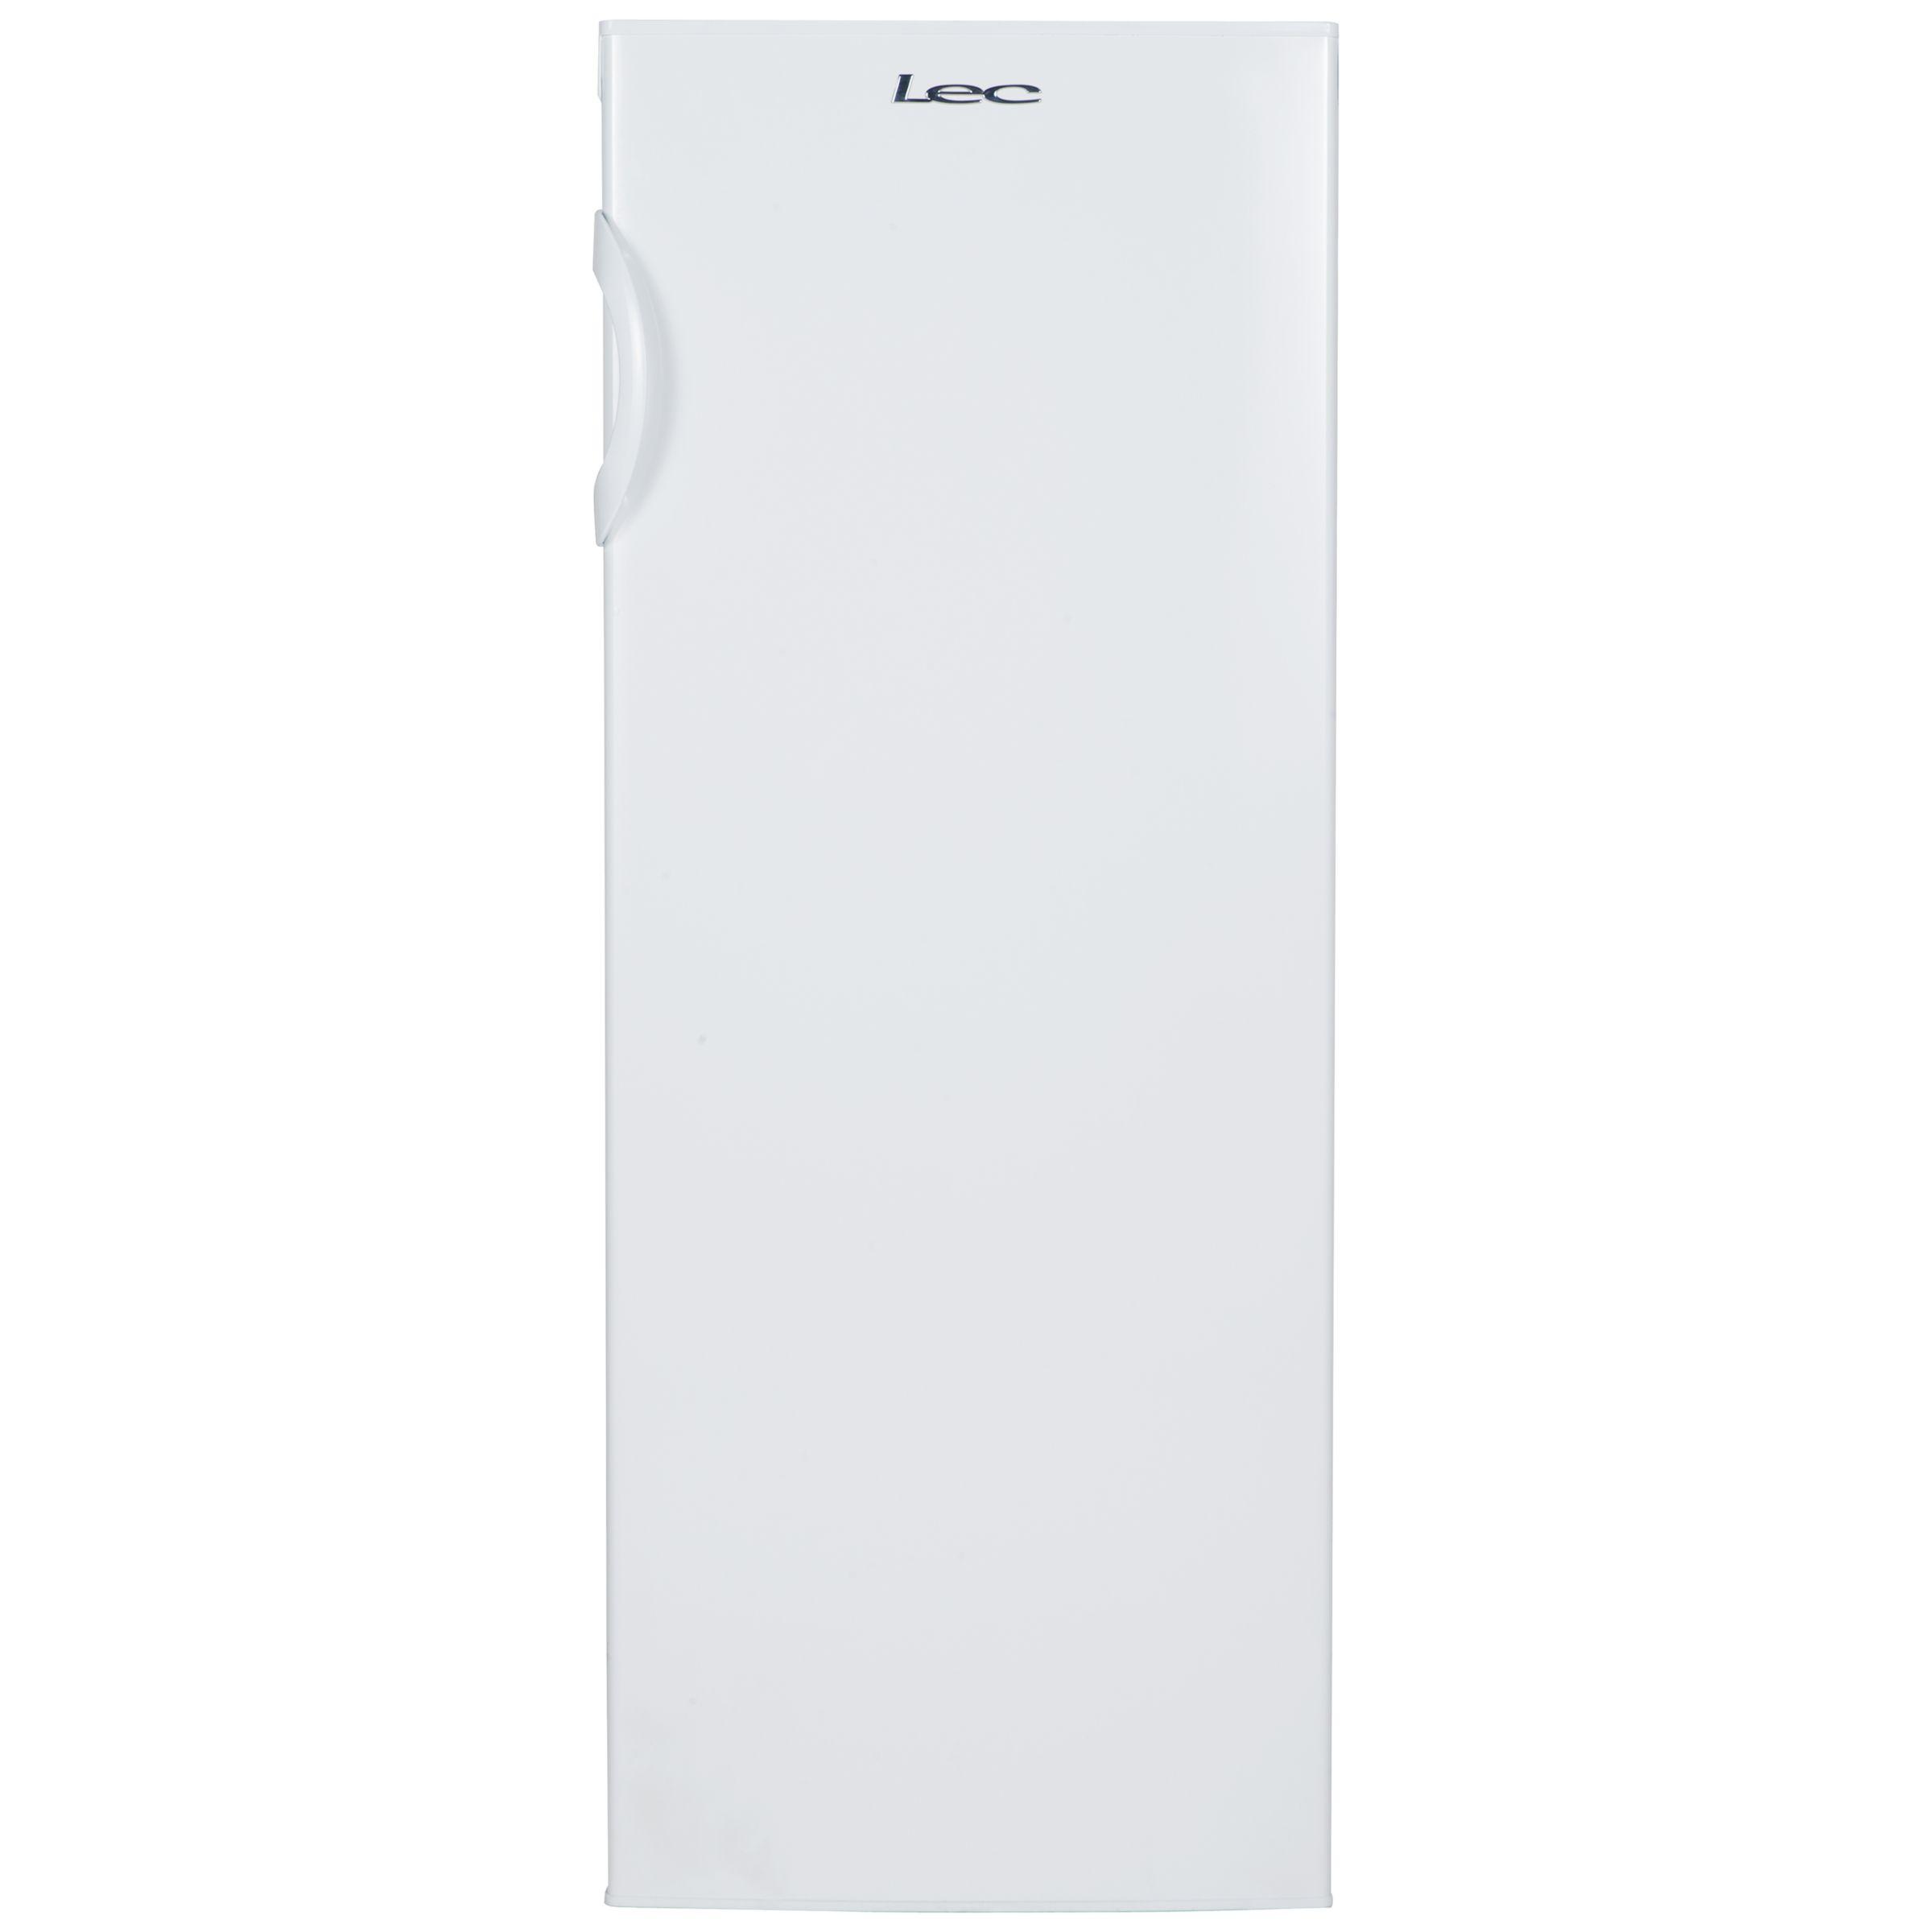 LEC Lec TL55144W Freestanding Tall Larder Fridge, A+ Energy Rating, 55cm Wide, White